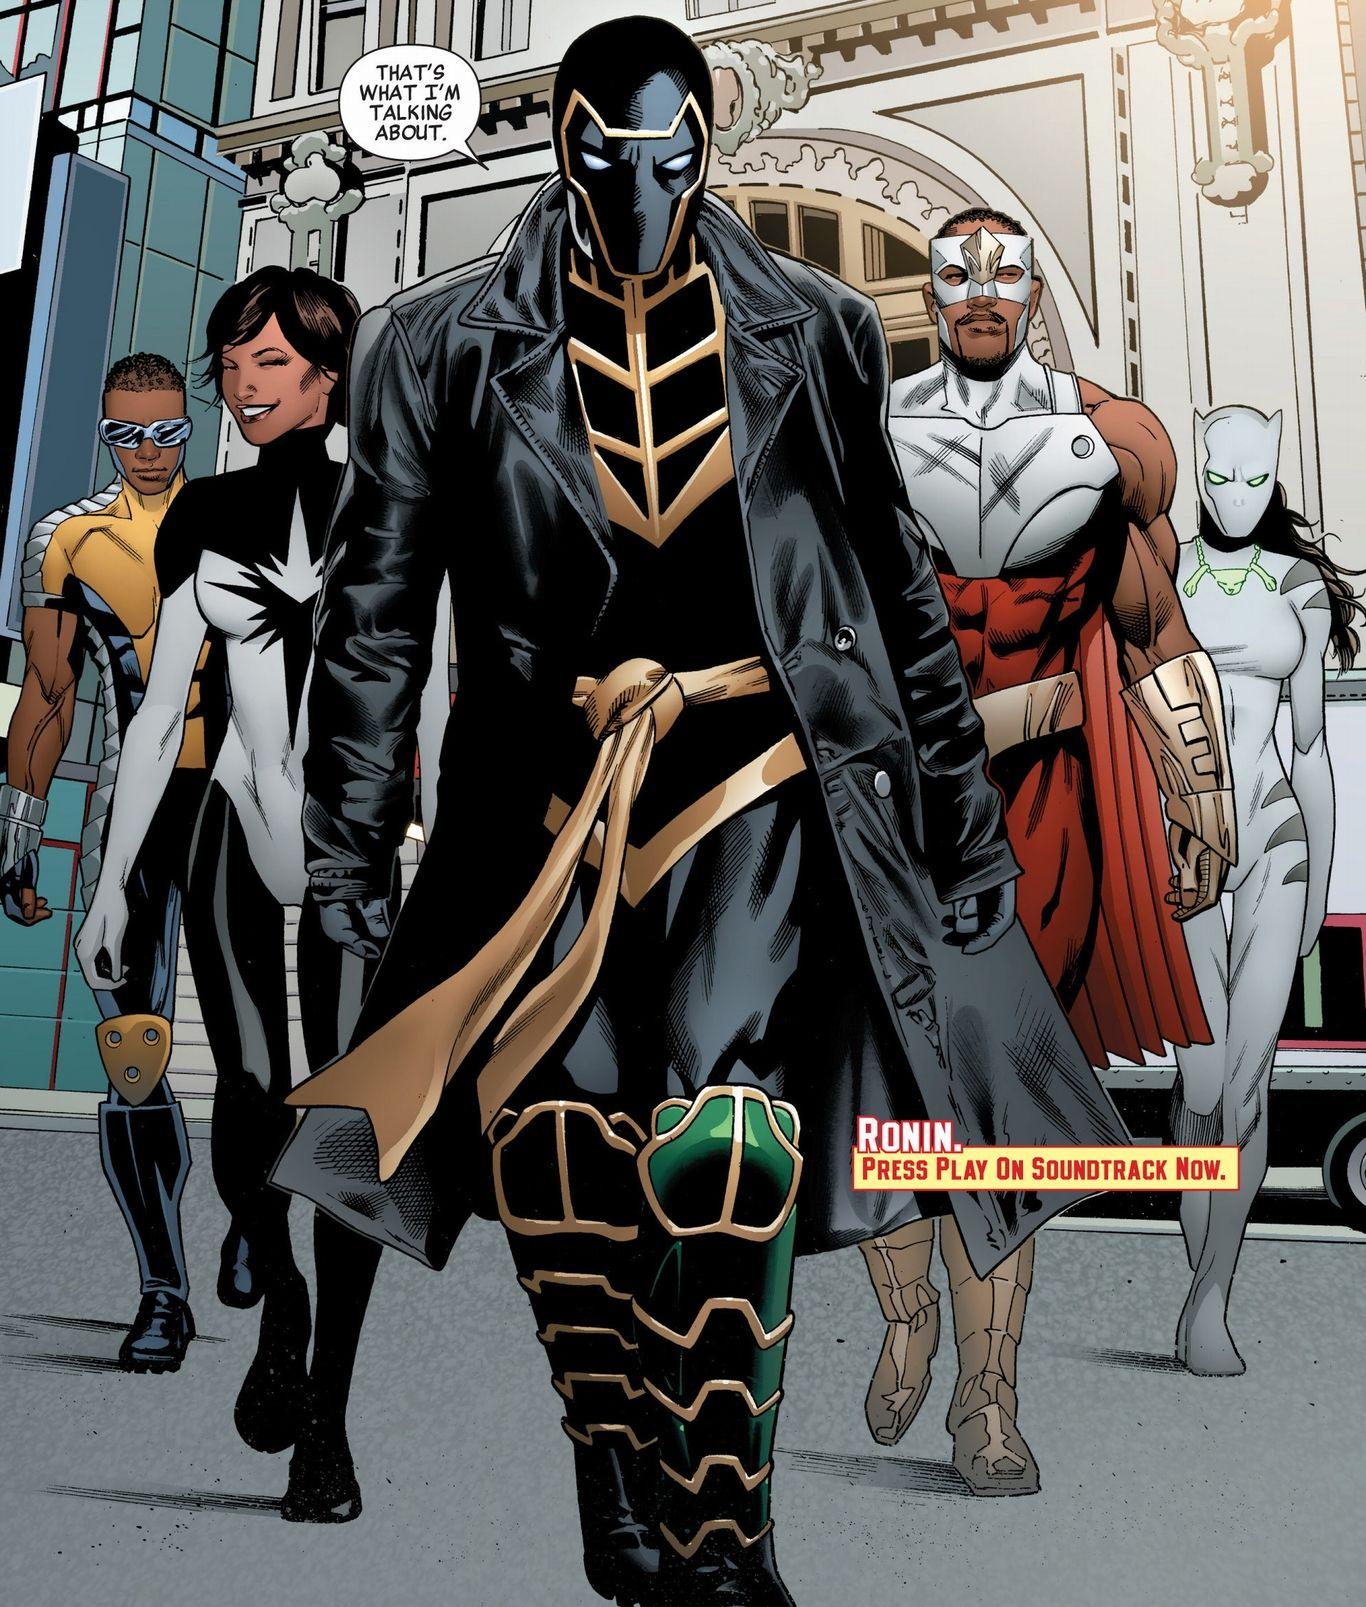 Black Avengers Anime, Comic Books & Graphic Novels